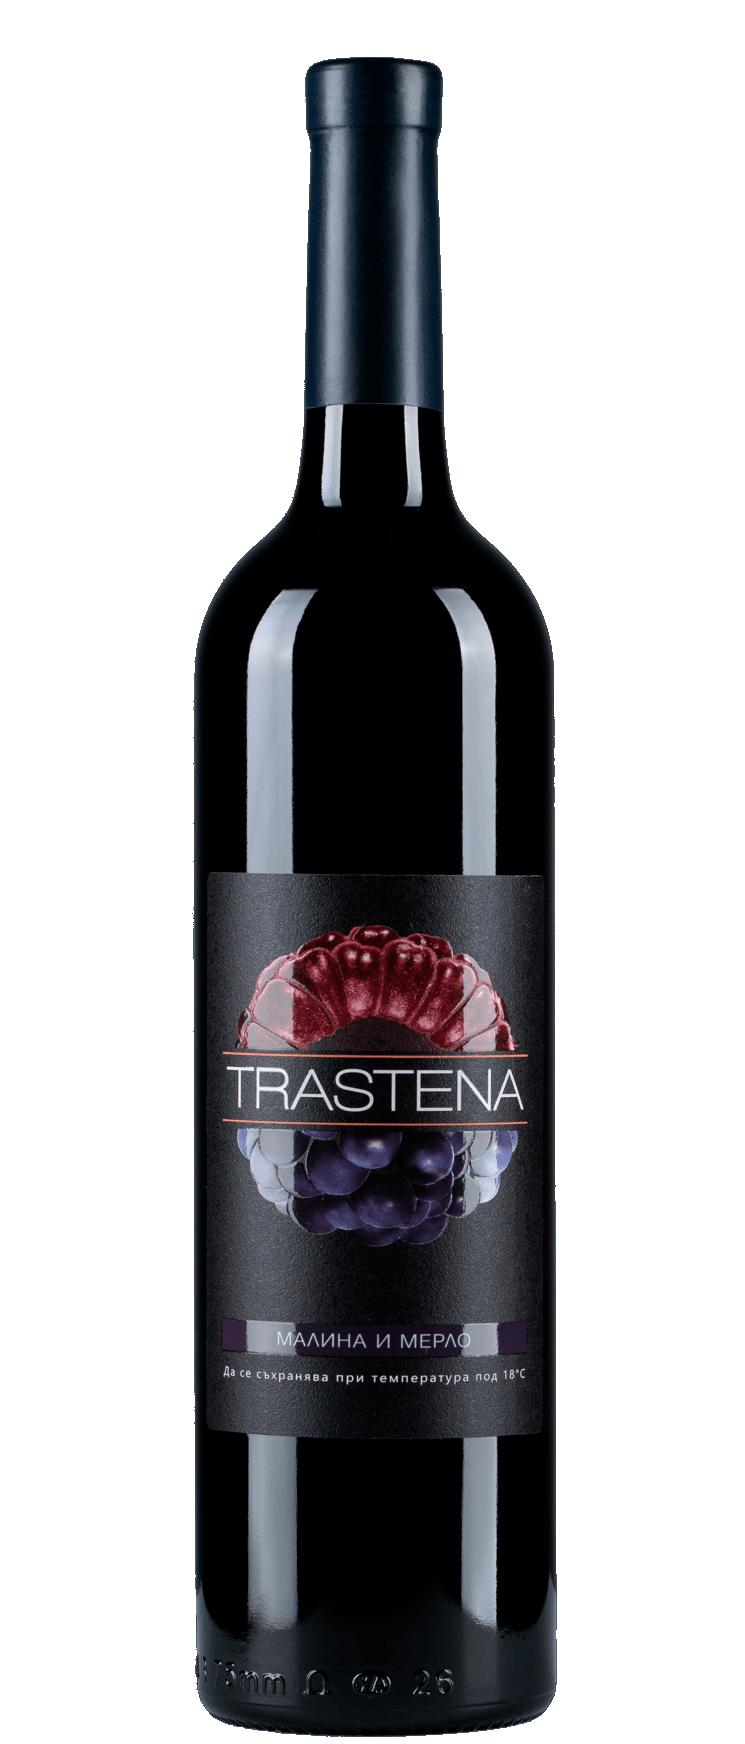 Малиново Вино Трастена Малина и Мерло 0.75 л